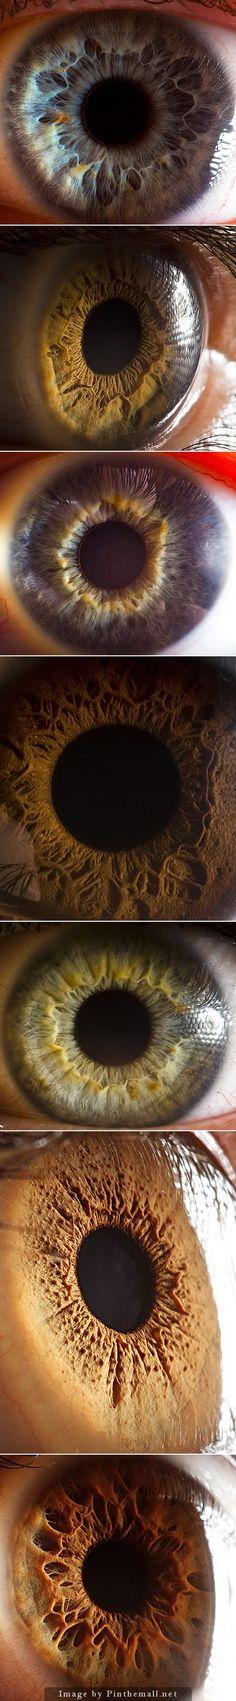 http://www.lostateminor.com/2011/07/15/incredible-macro-photography-of-peoples-eyes/